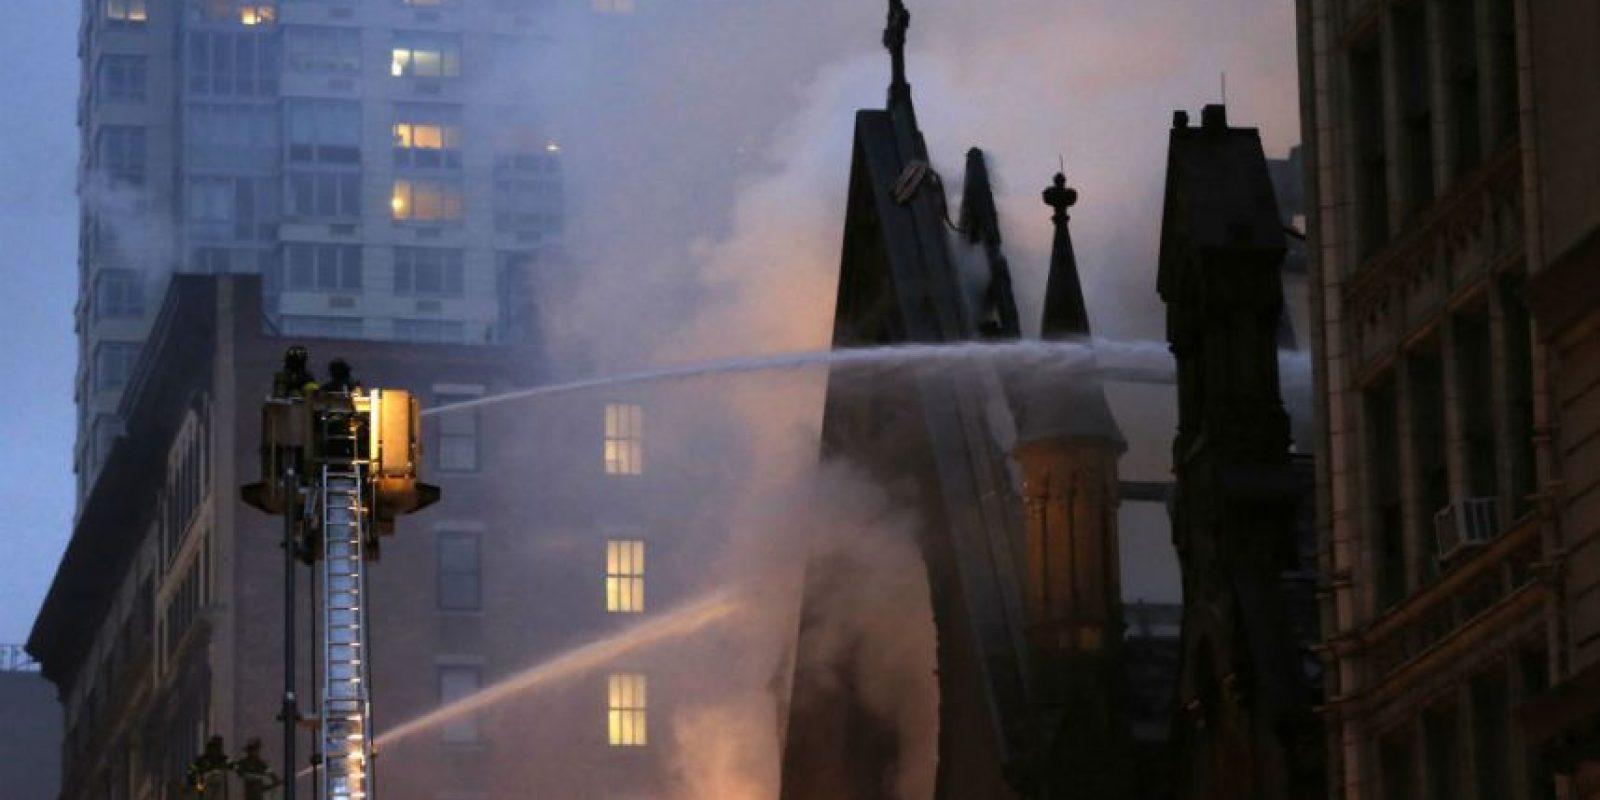 La catedral ortodoxade San Sava se incendió este domingo. Foto:AP